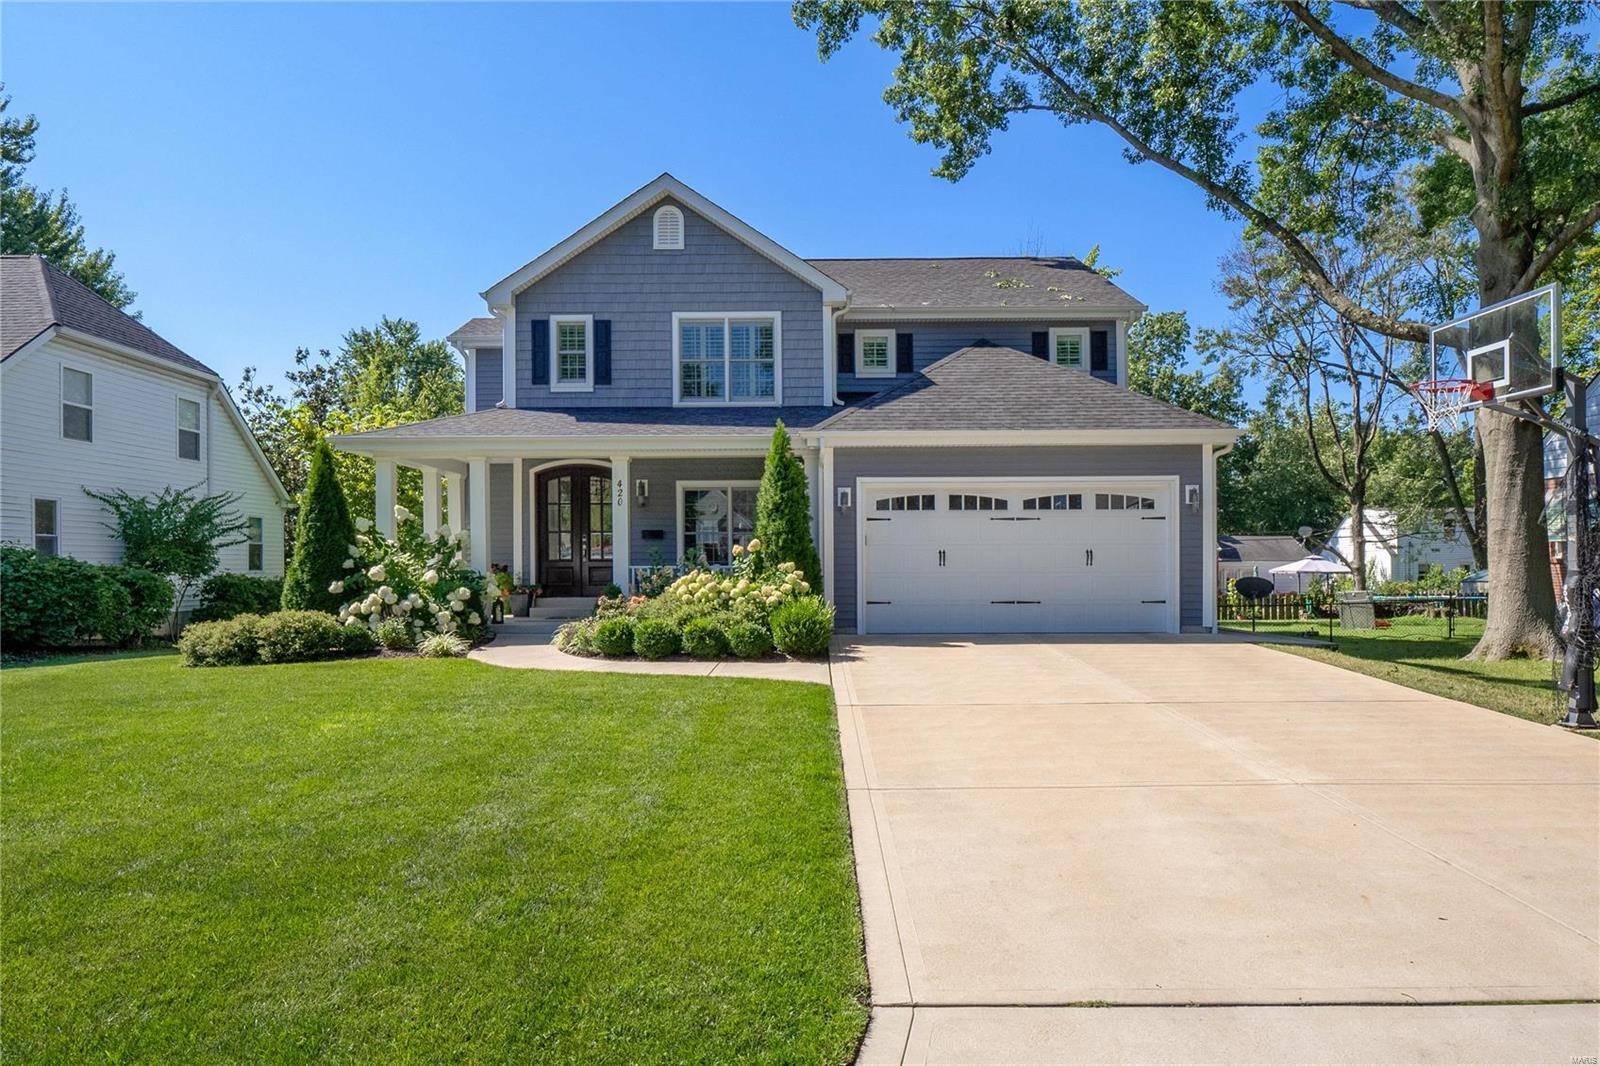 420 Fairway Property Photo - St Louis, MO real estate listing